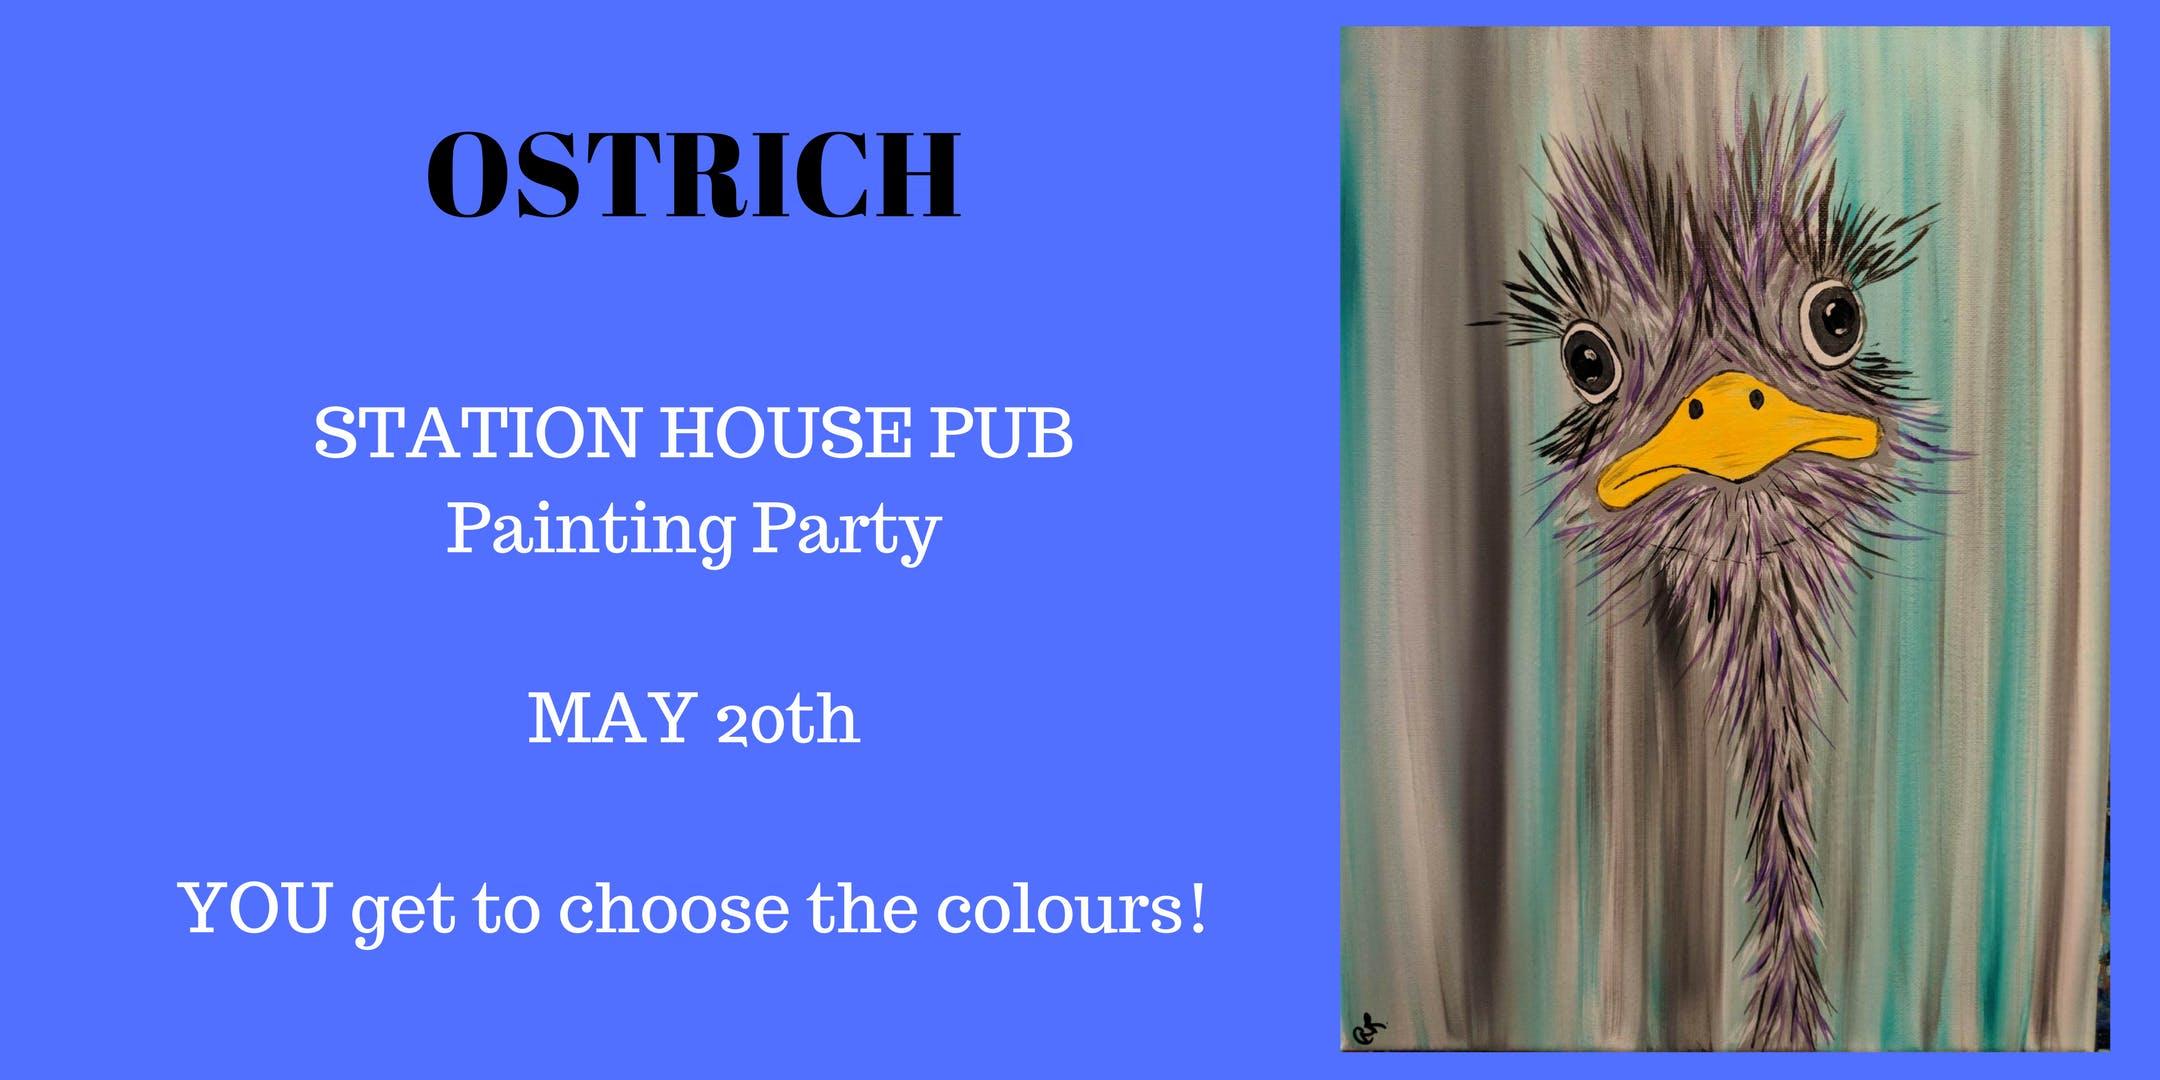 Stationhouse Bar & Grill Aldergrove  - Ostrich